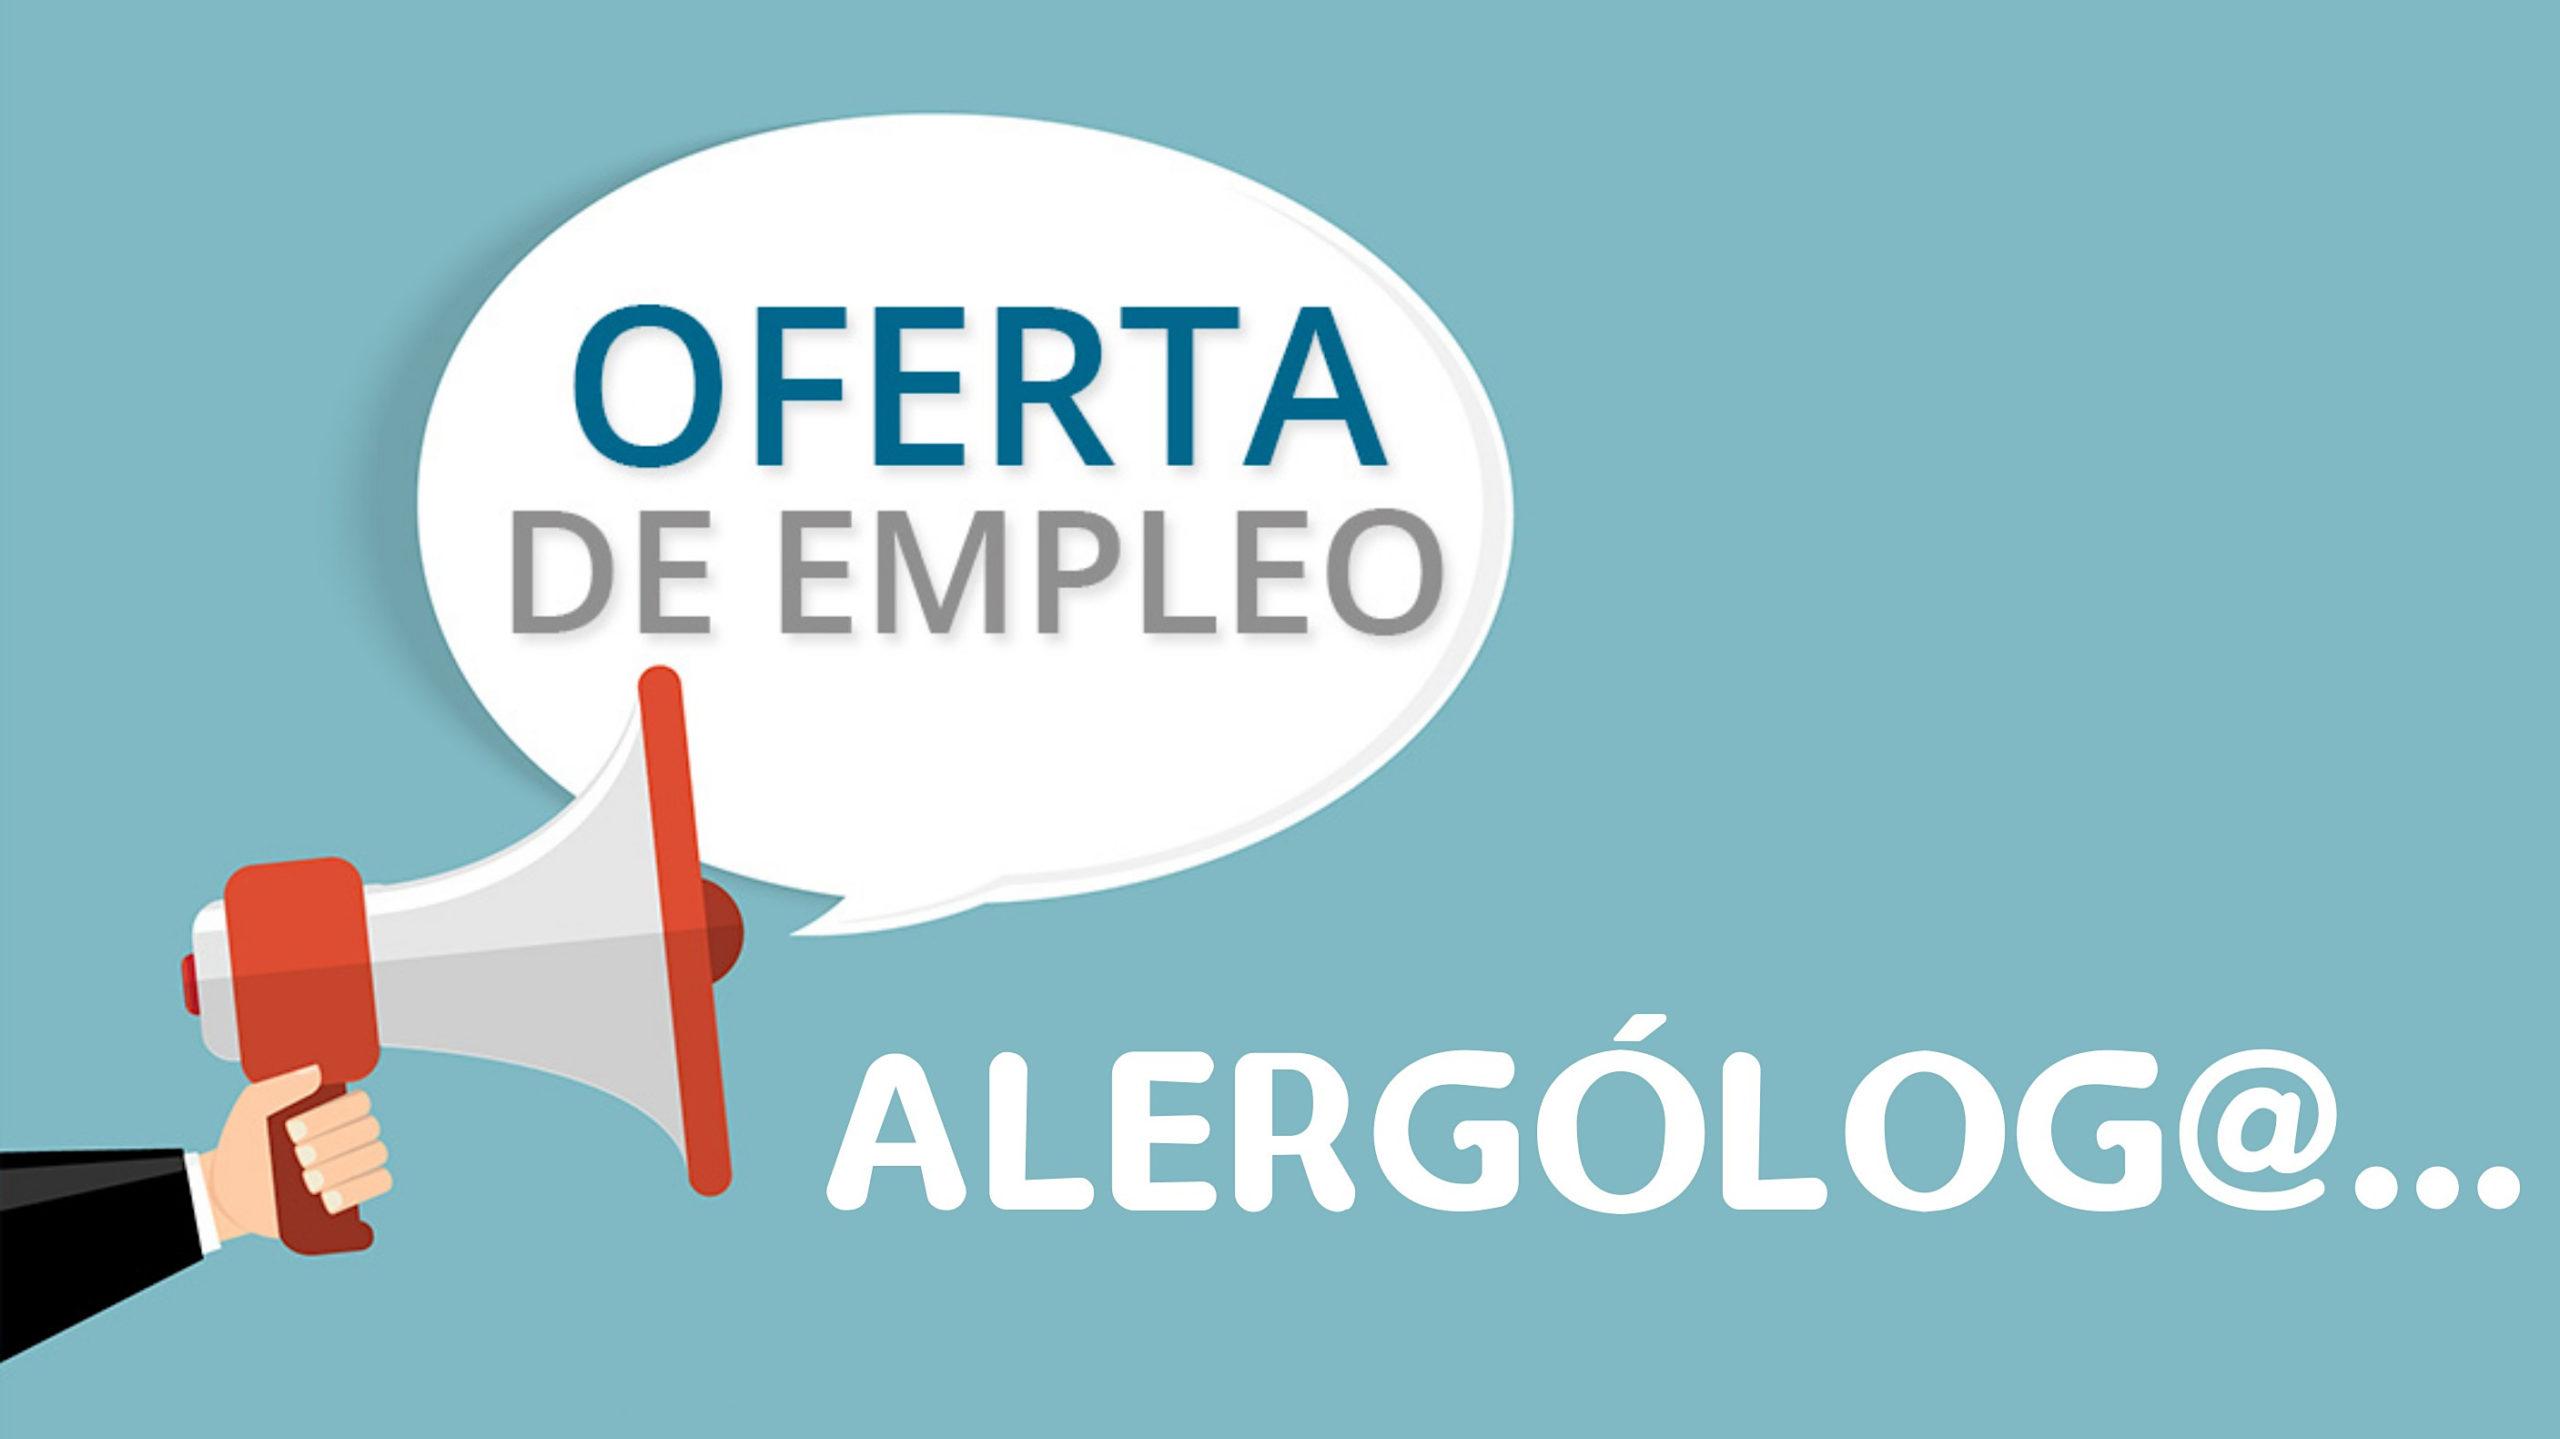 oferta empleo alergolog@